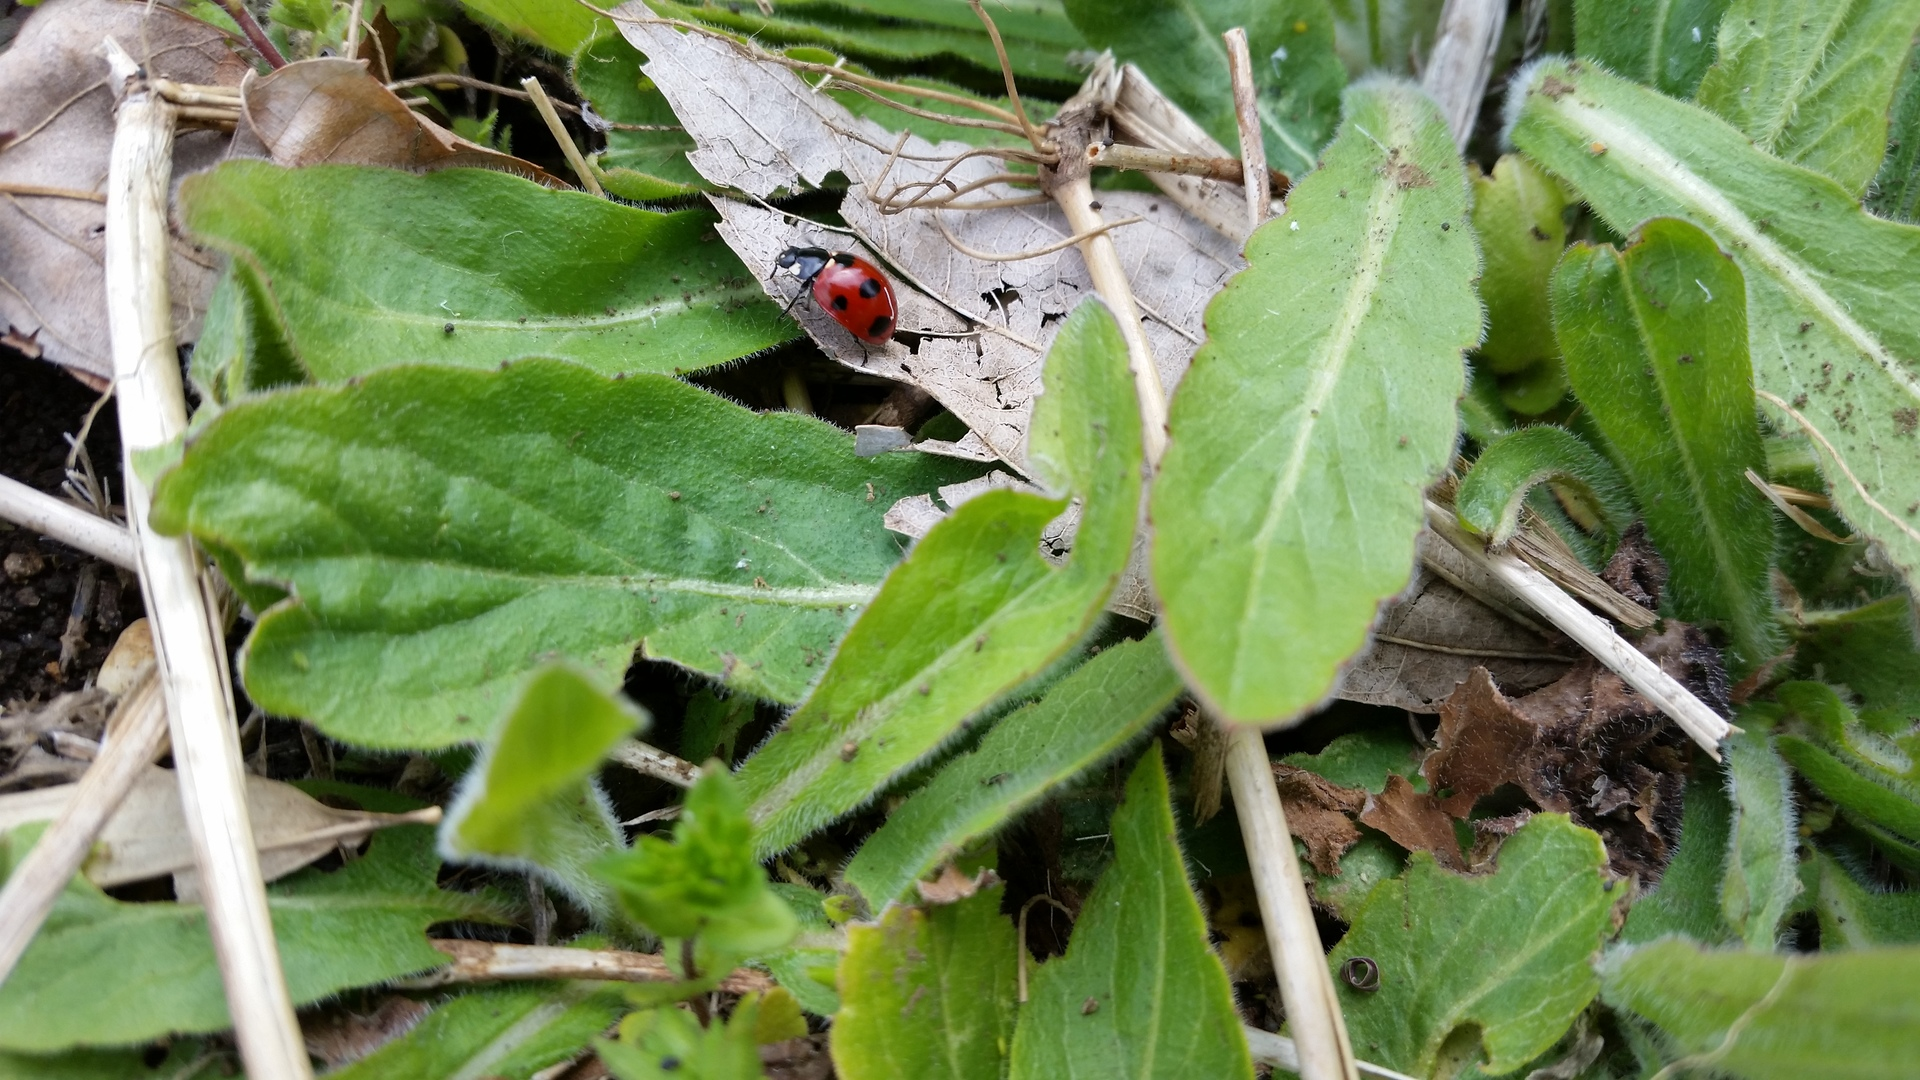 Ladybug   present4_u, close-up, environment, leaf